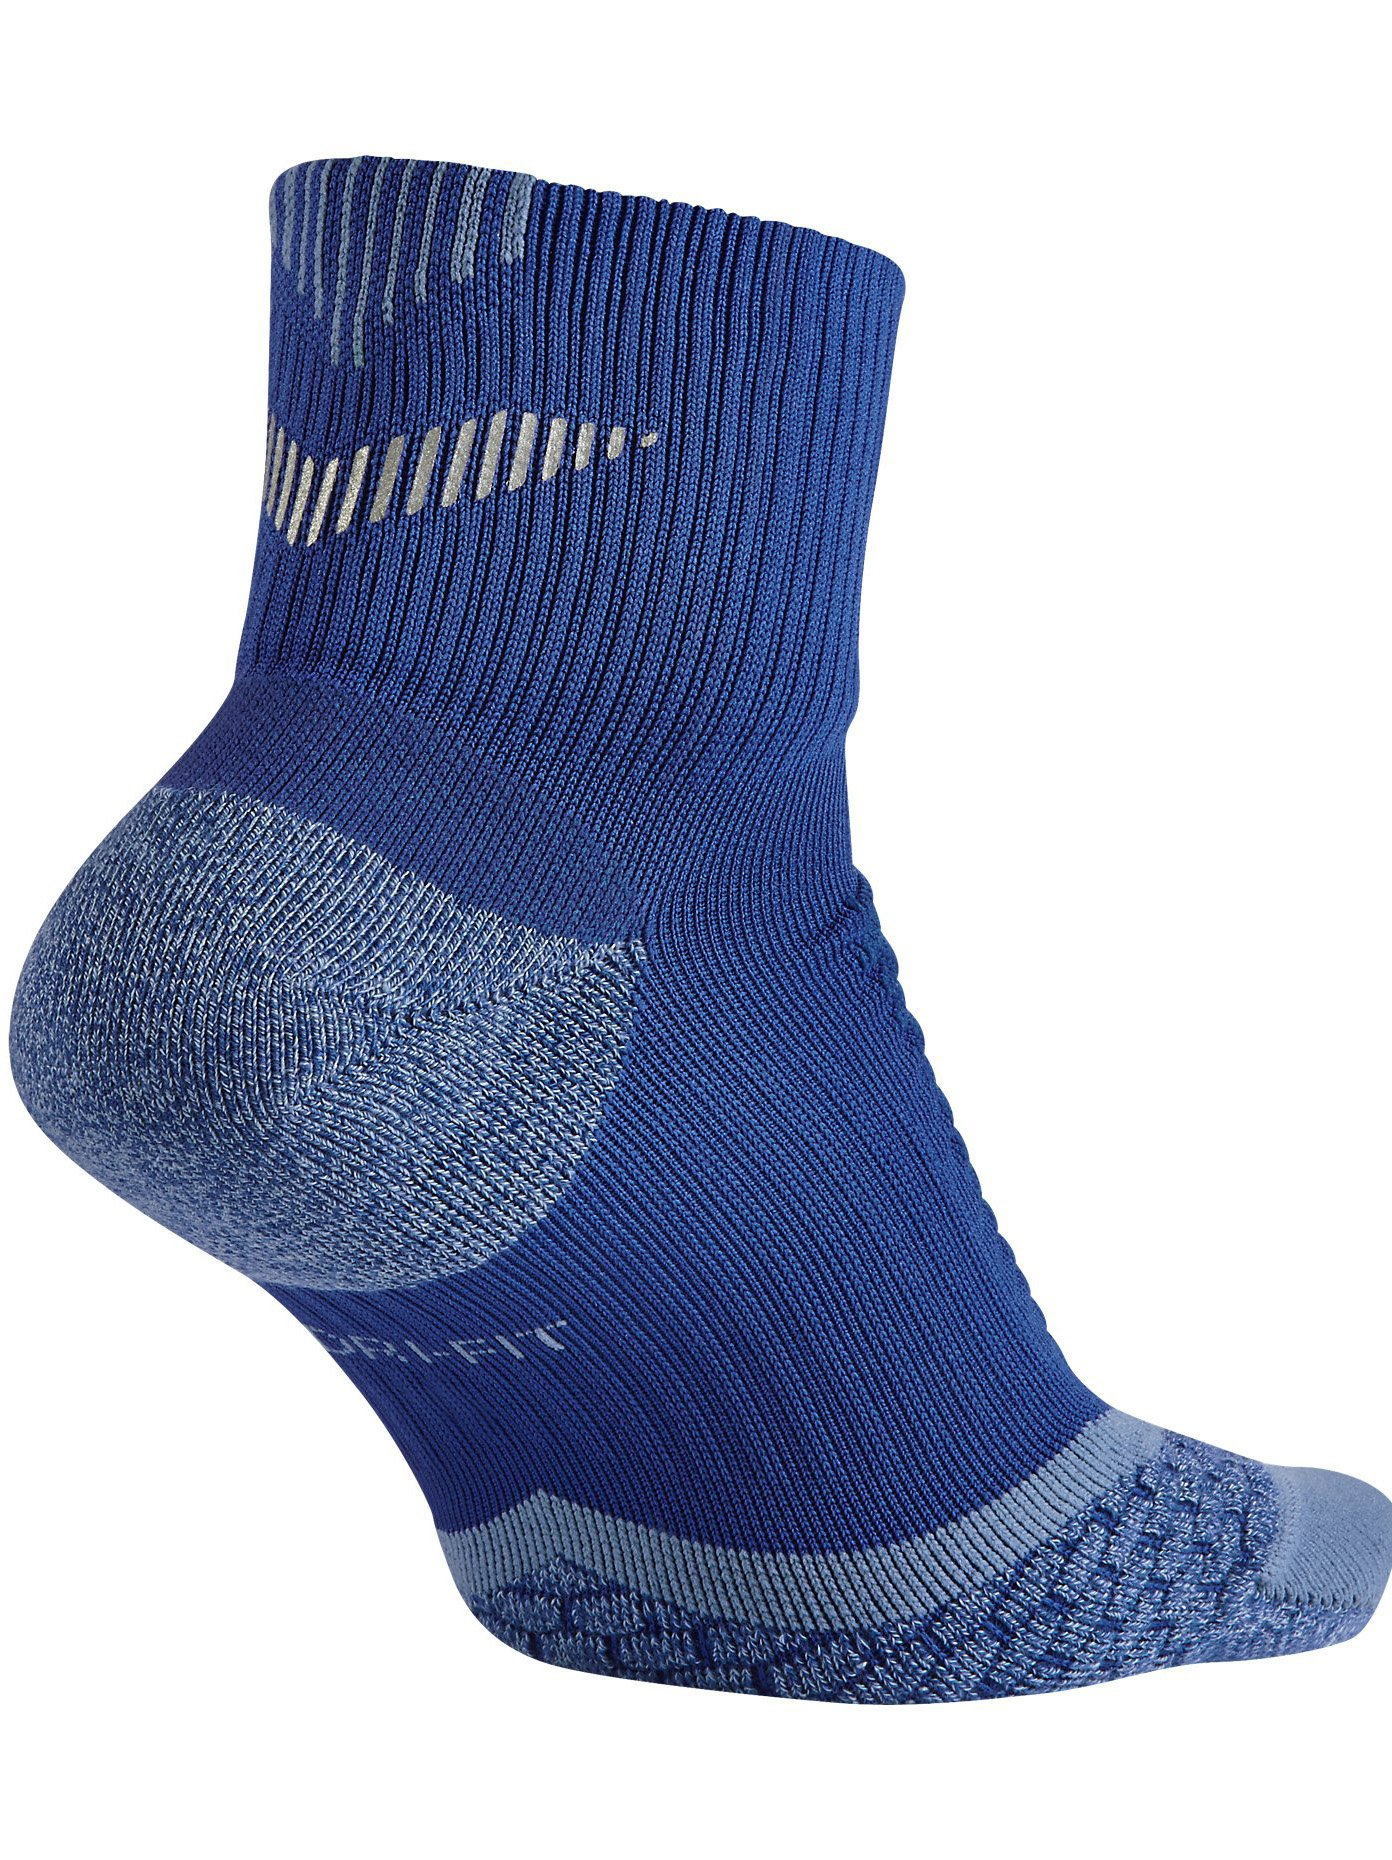 PonožkyNike Elite Running Cushion QTR